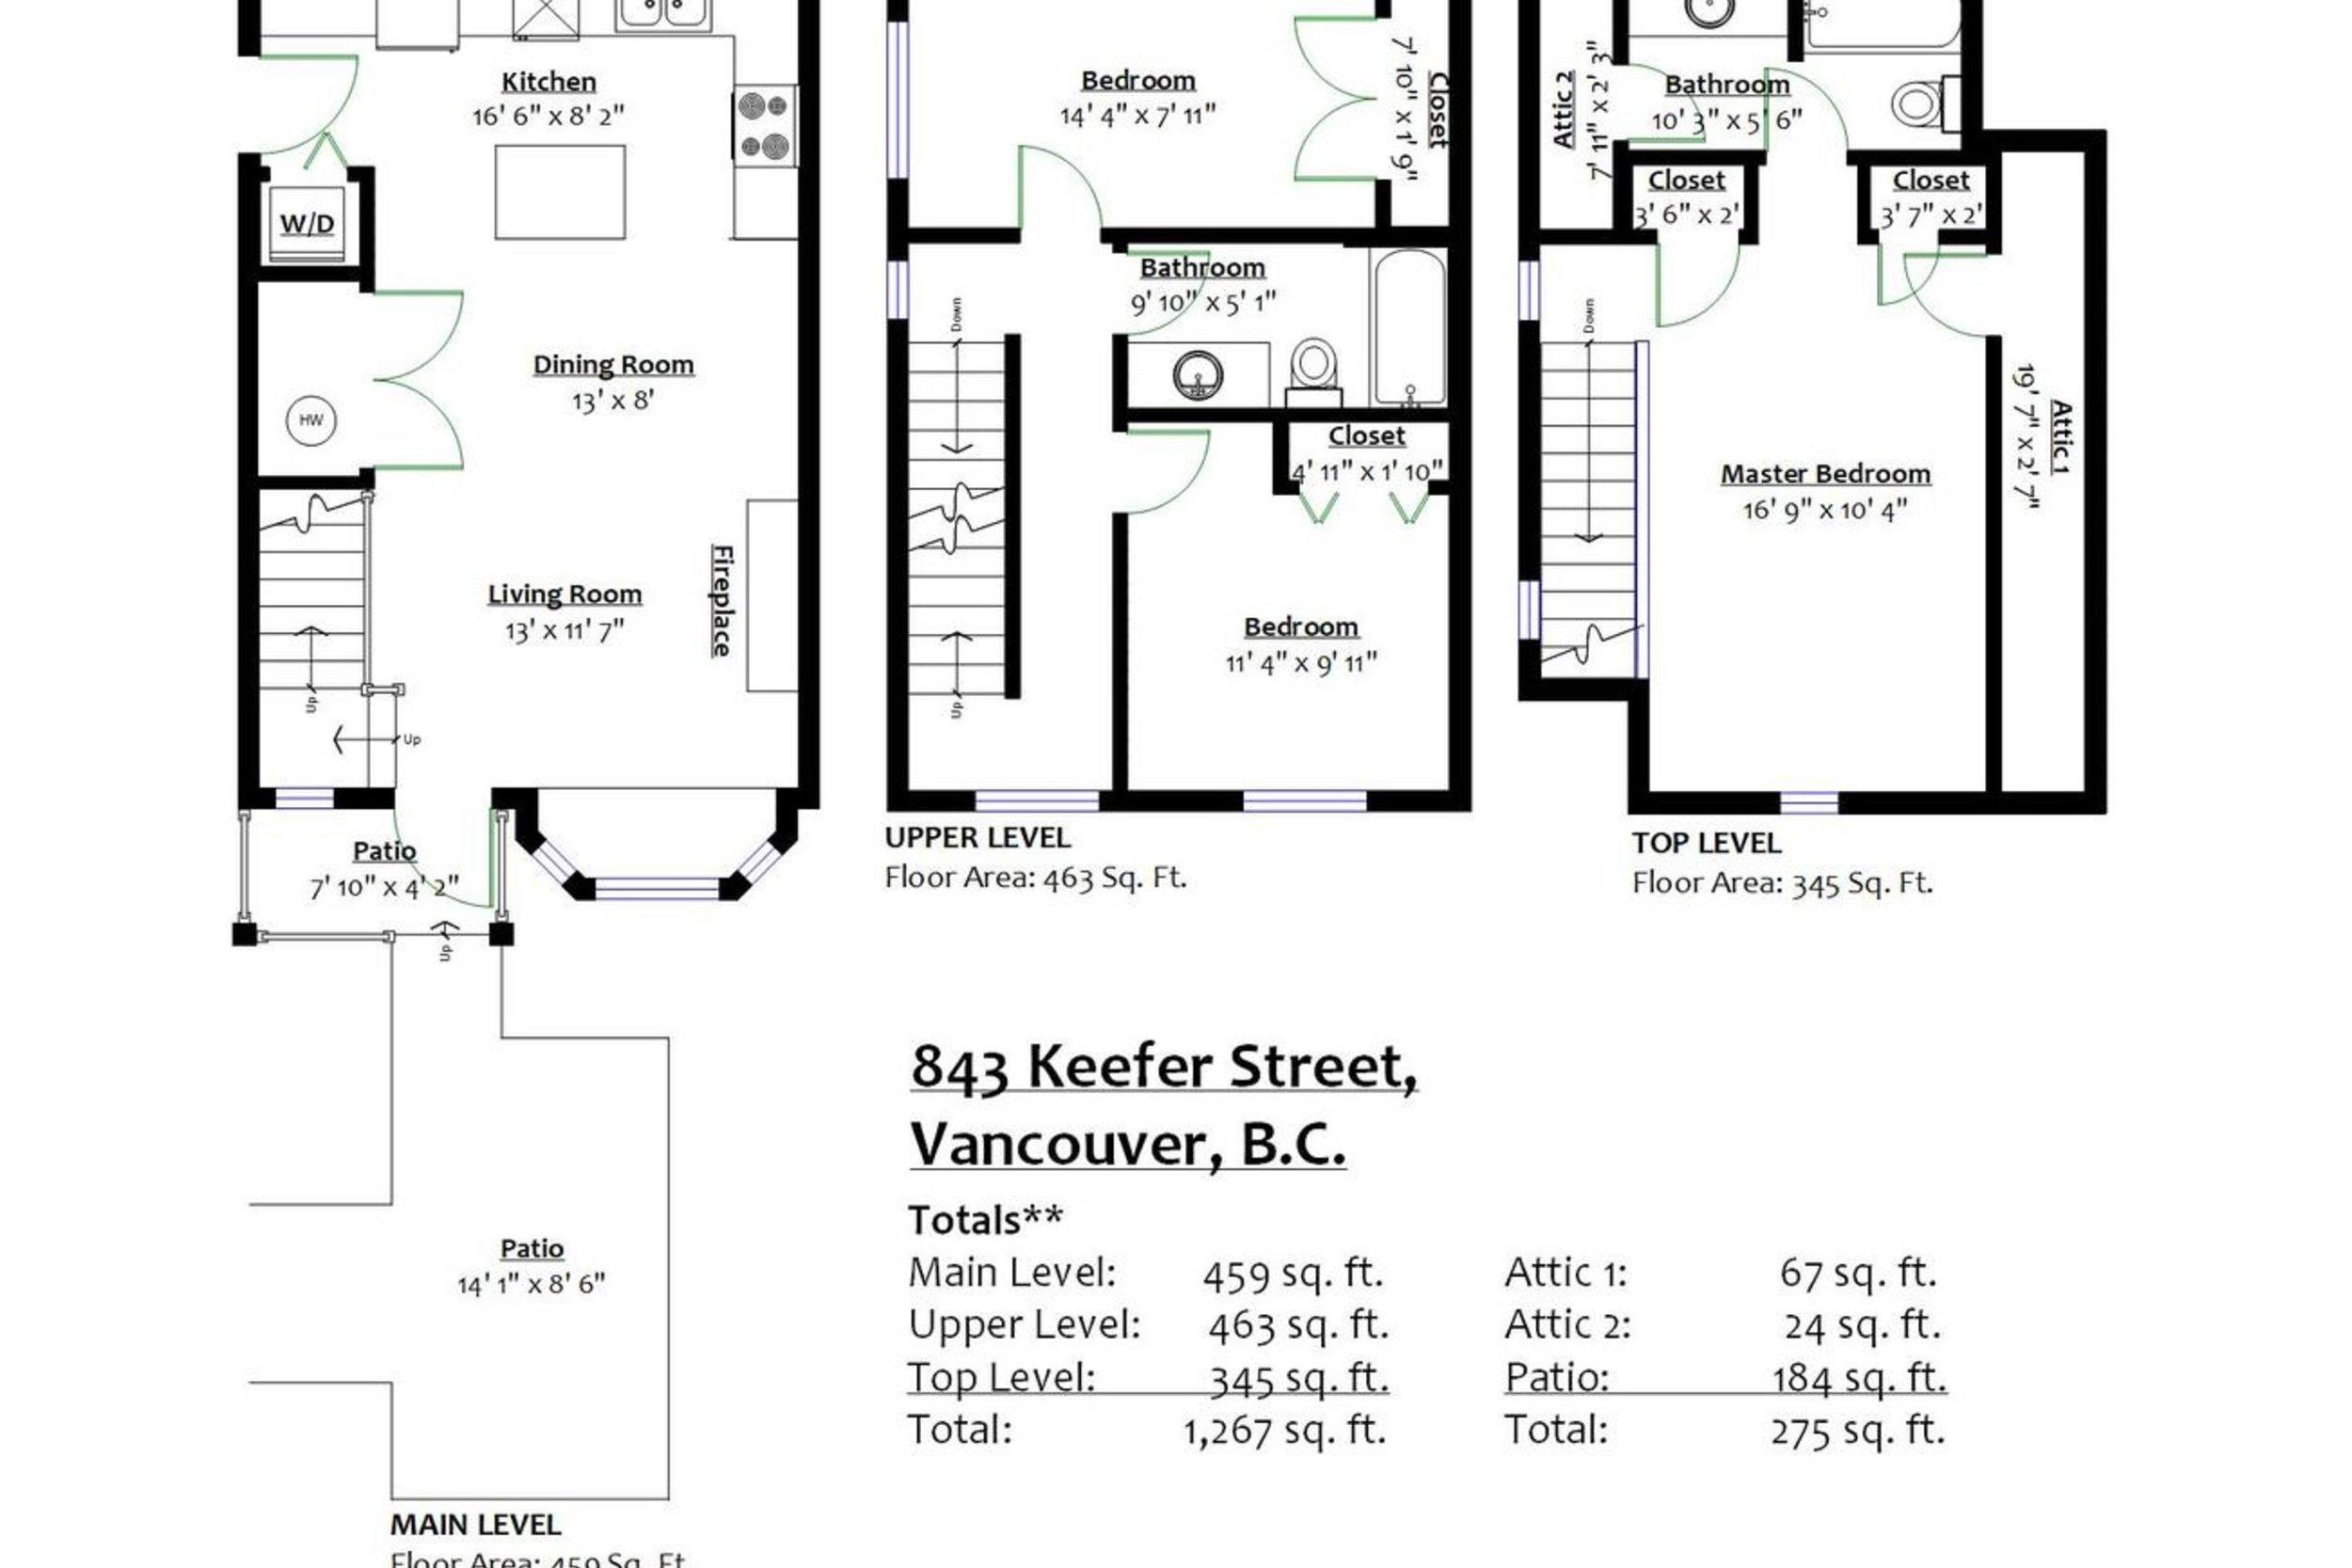 843 Keefer St Vancouver BC V6A-003-020-Floor Plan-MLS_Size.jpg